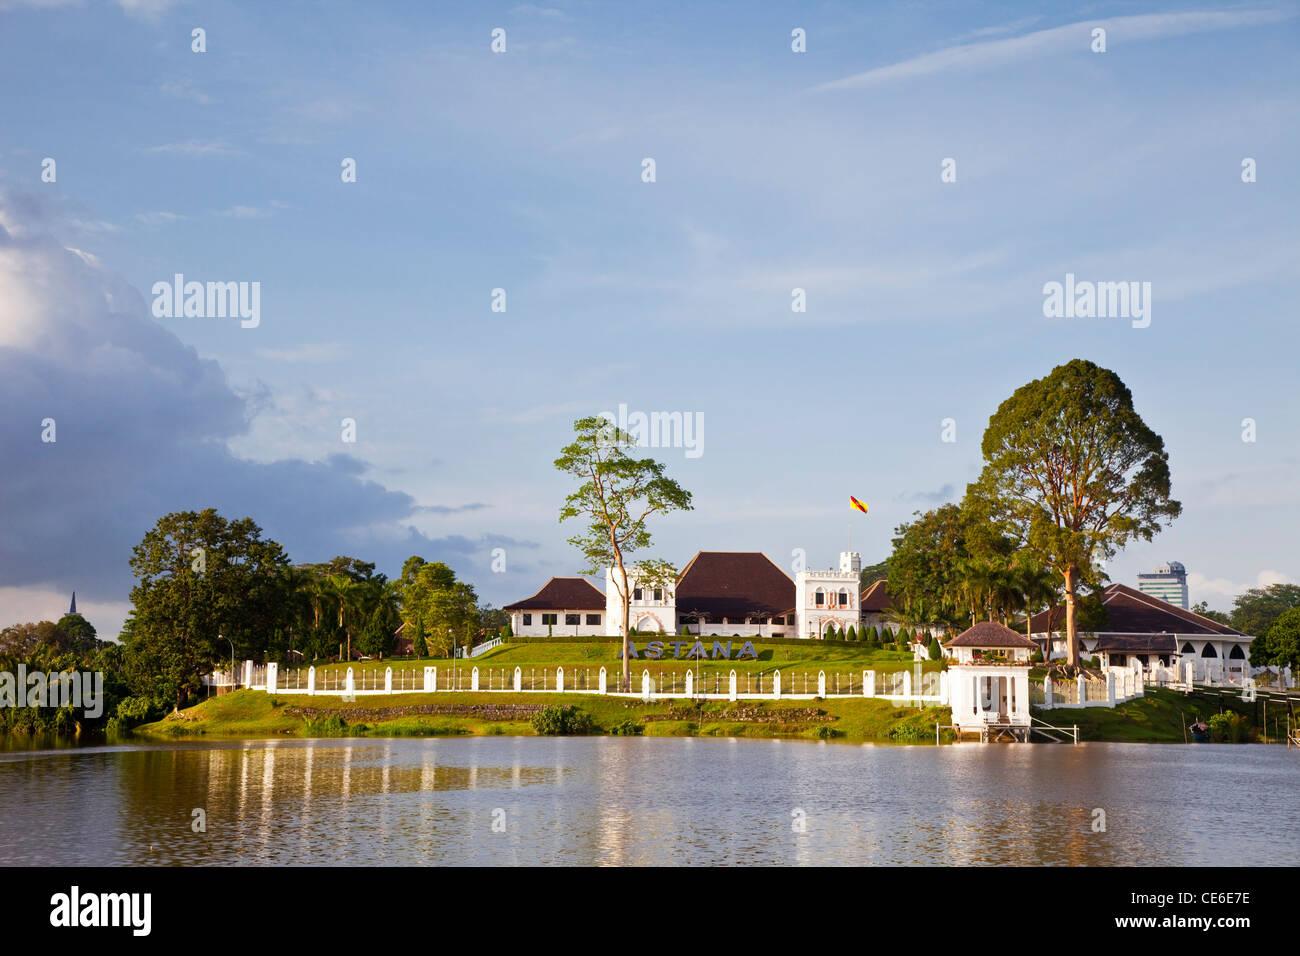 The Astana (Palace), built by Charles Brooke in 1870. Kuching, Sarawak, Borneo, Malaysia. - Stock Image